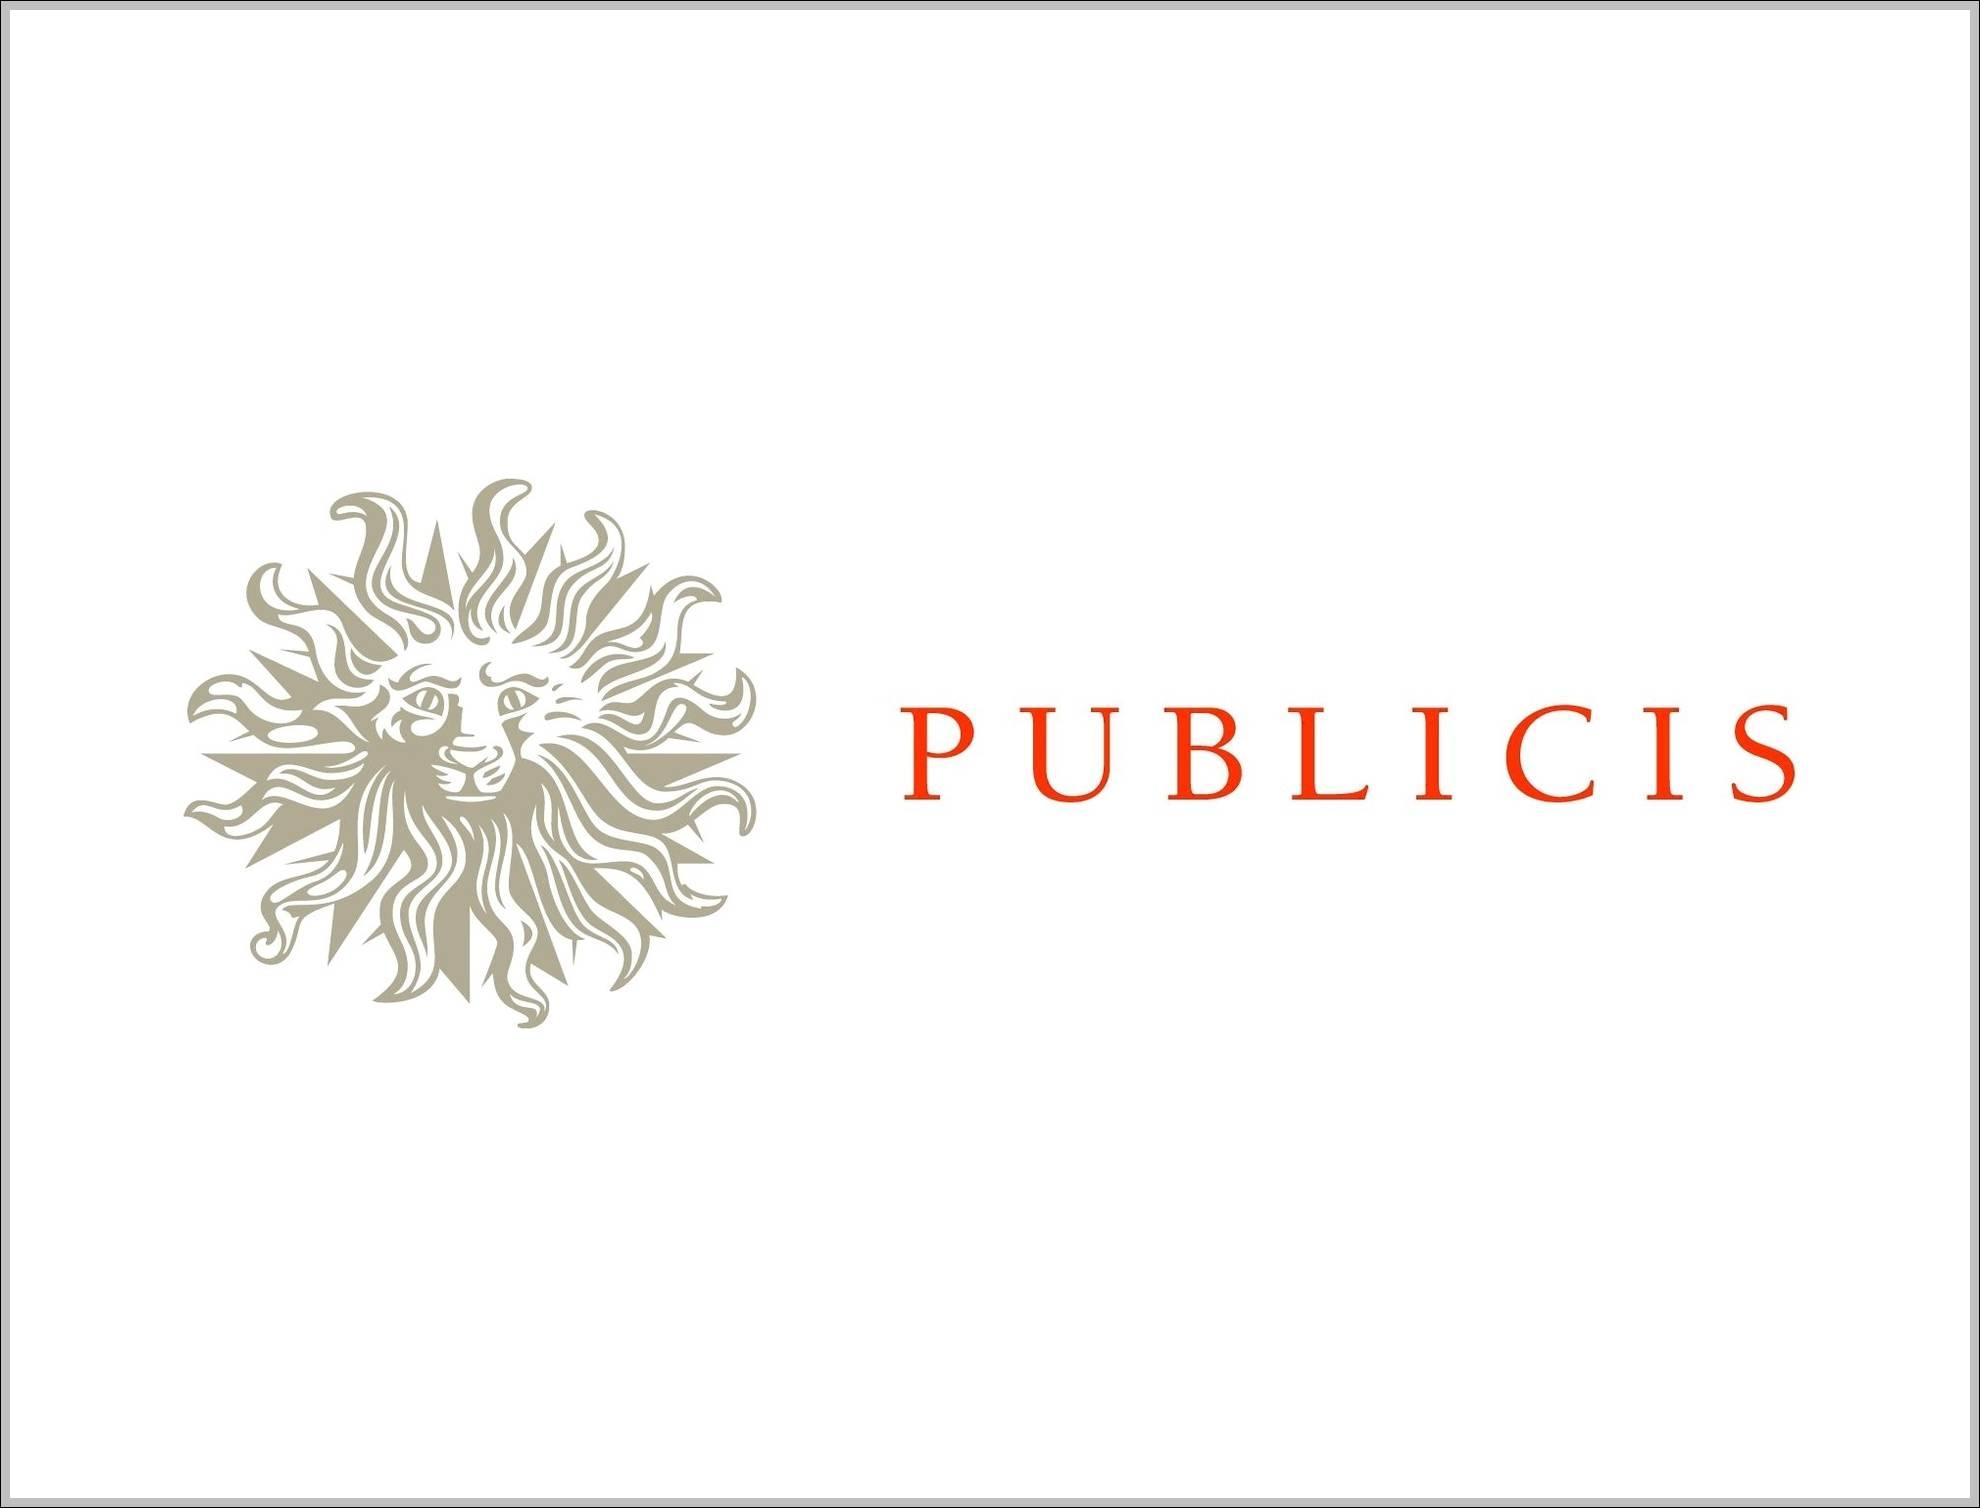 Publicis logo old